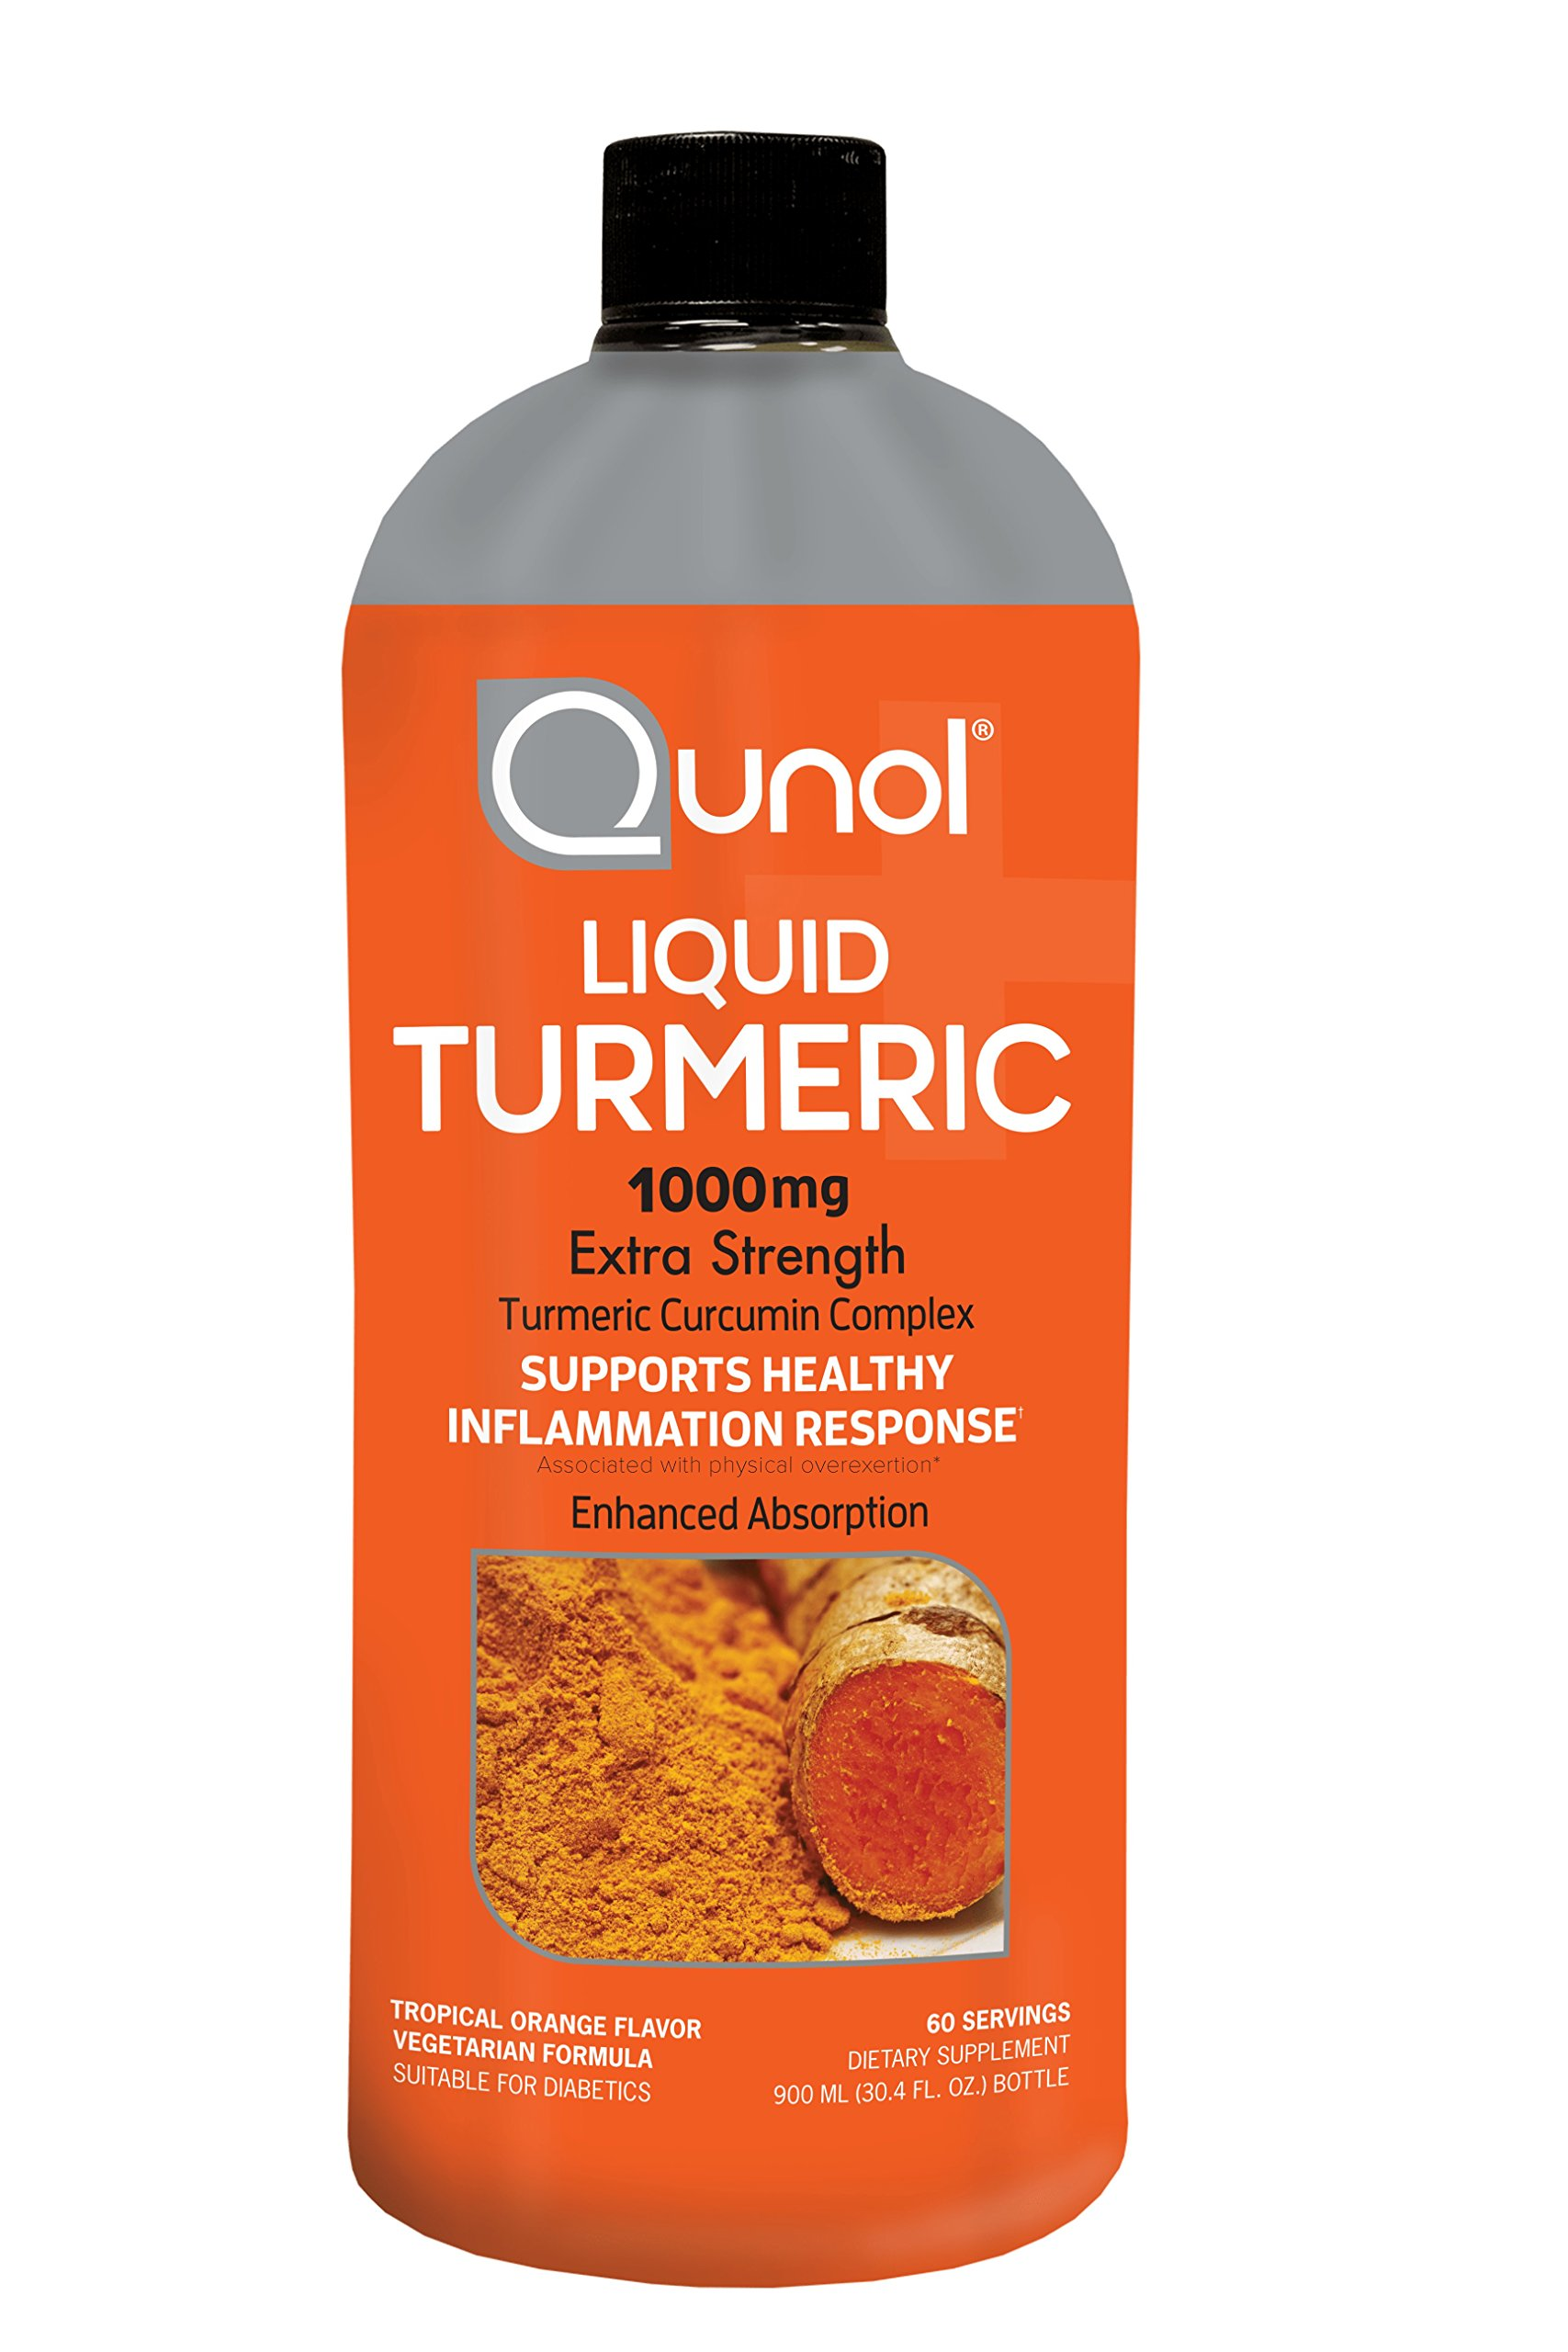 Qunol Liquid Turmeric Curcumin with Bioperine 1000mg, Anti-Inflammatory, Dietary Supplement, Extra Strength, 60 Servings